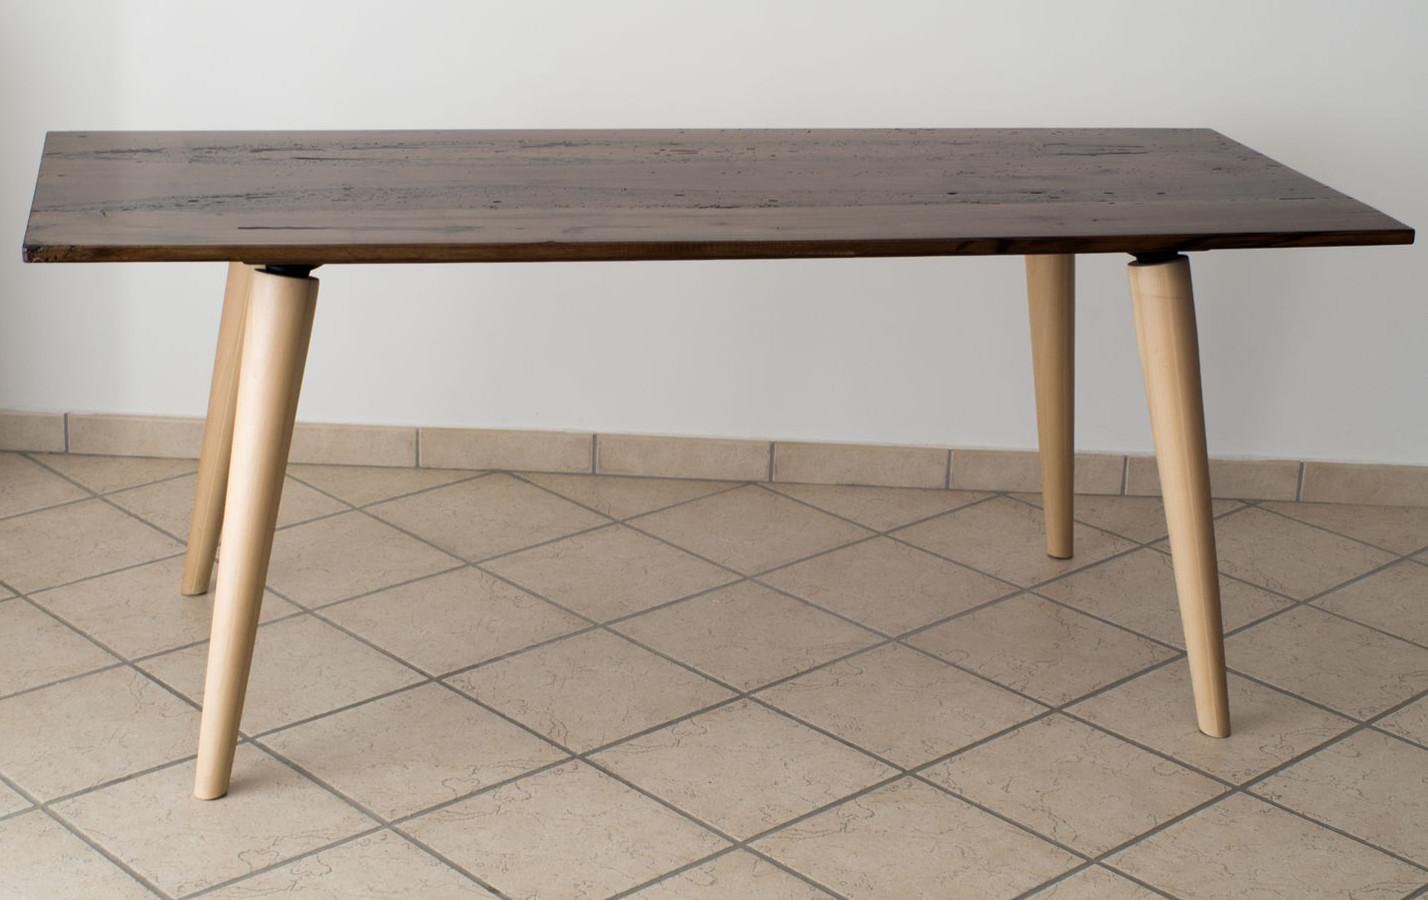 tisch aus mit epoxidharz behandeltem briccola holz. Black Bedroom Furniture Sets. Home Design Ideas